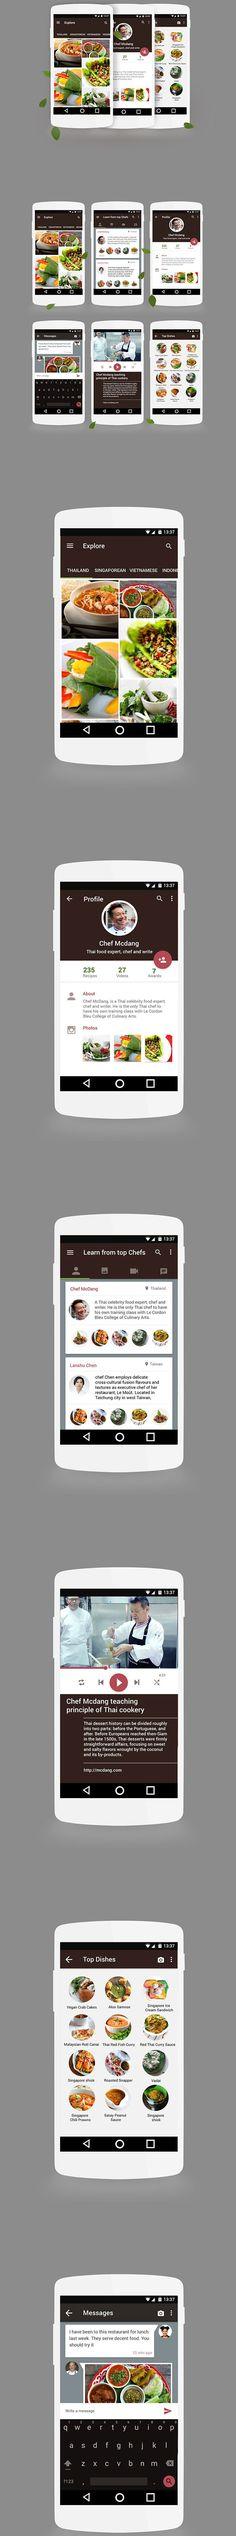 Mobile UI Design Inspiration #40 - Smashfreakz